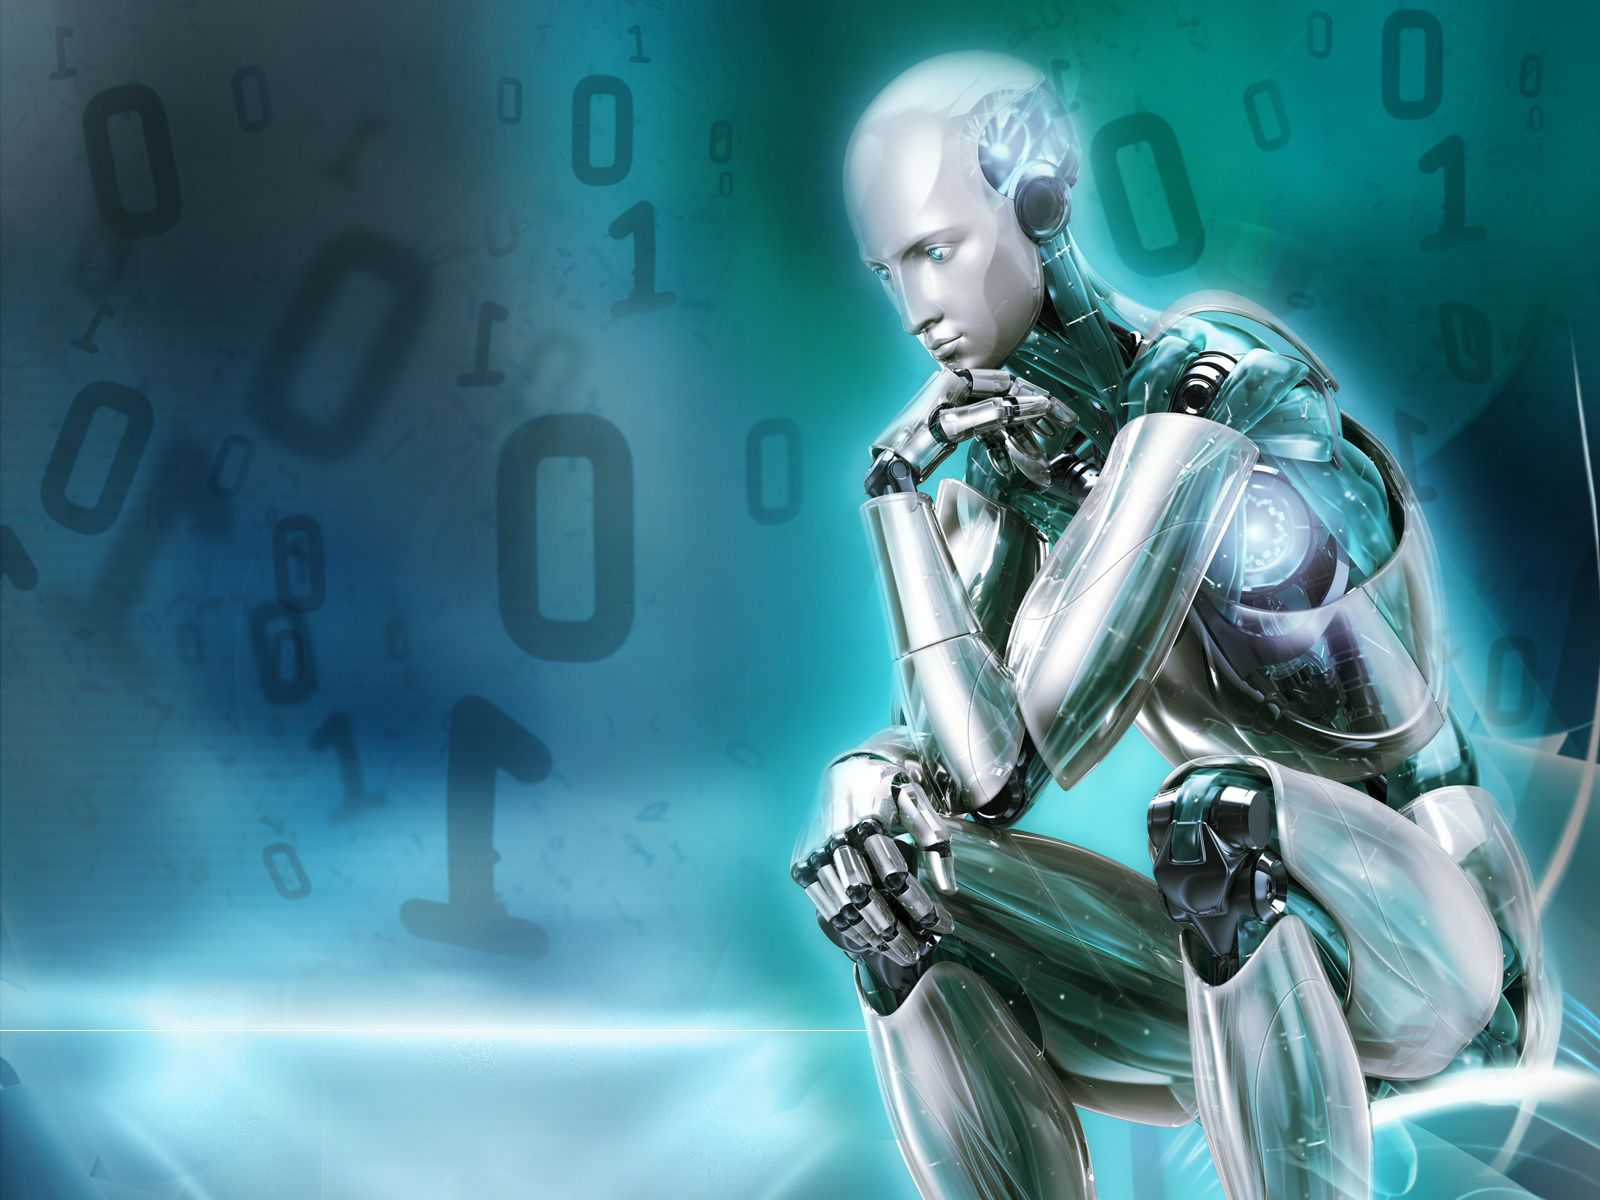 Retro Robot Wallpaper Backgrounds 1600x1200